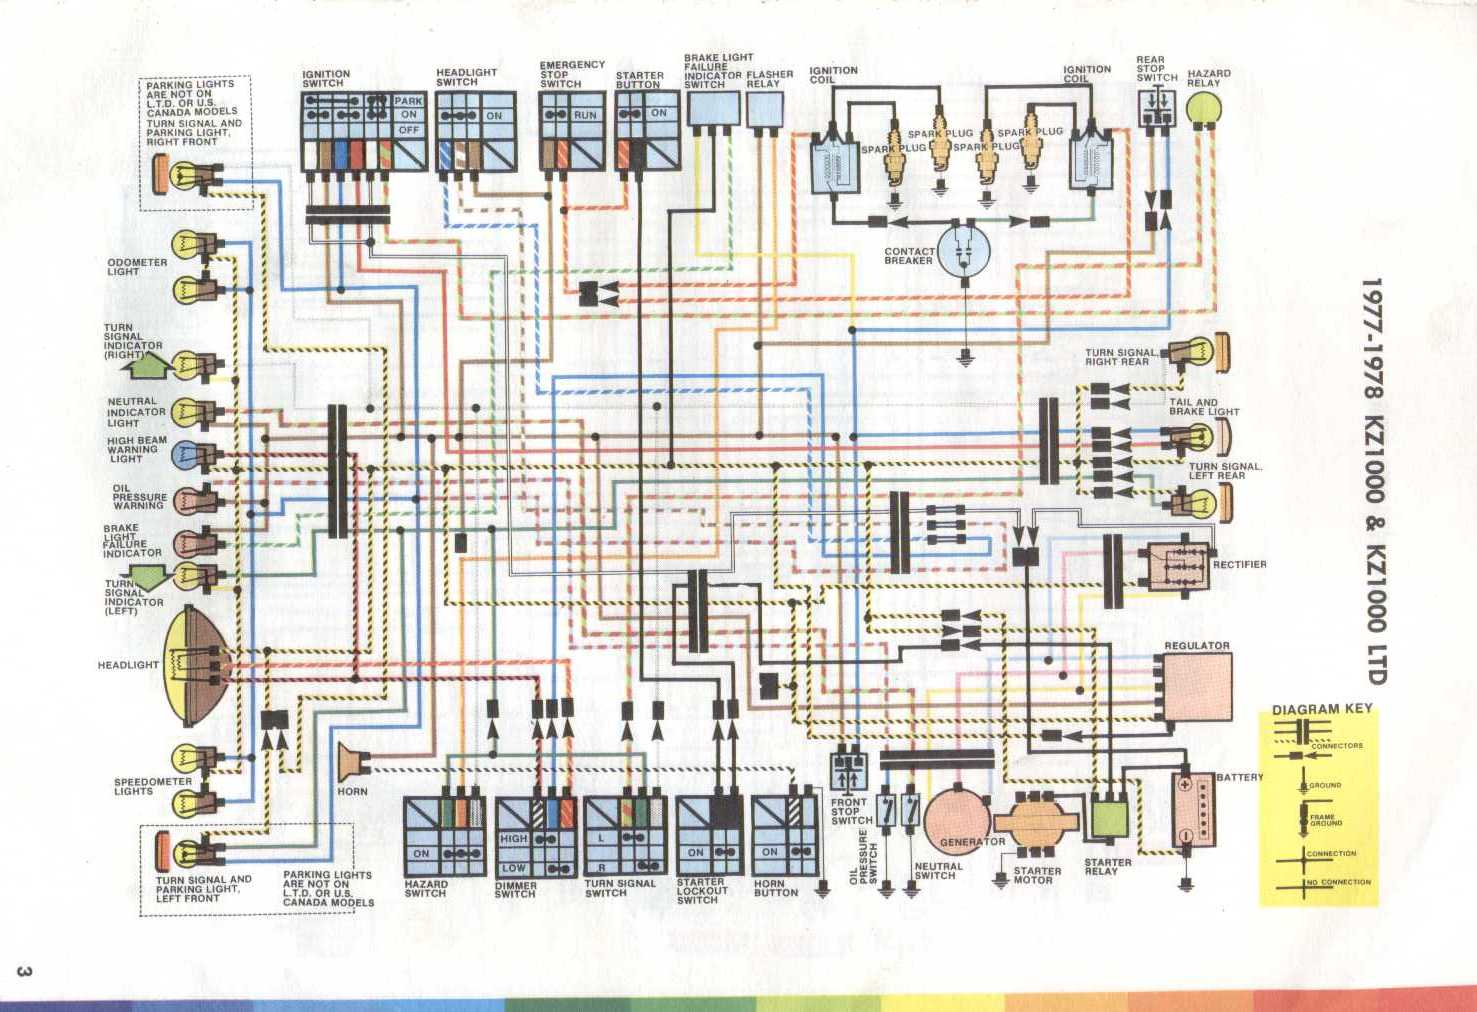 oz_4300] 77 kawasaki kz1000 wiring diagram download diagram  intel phot bocep frag animo umize hapolo mohammedshrine librar wiring 101